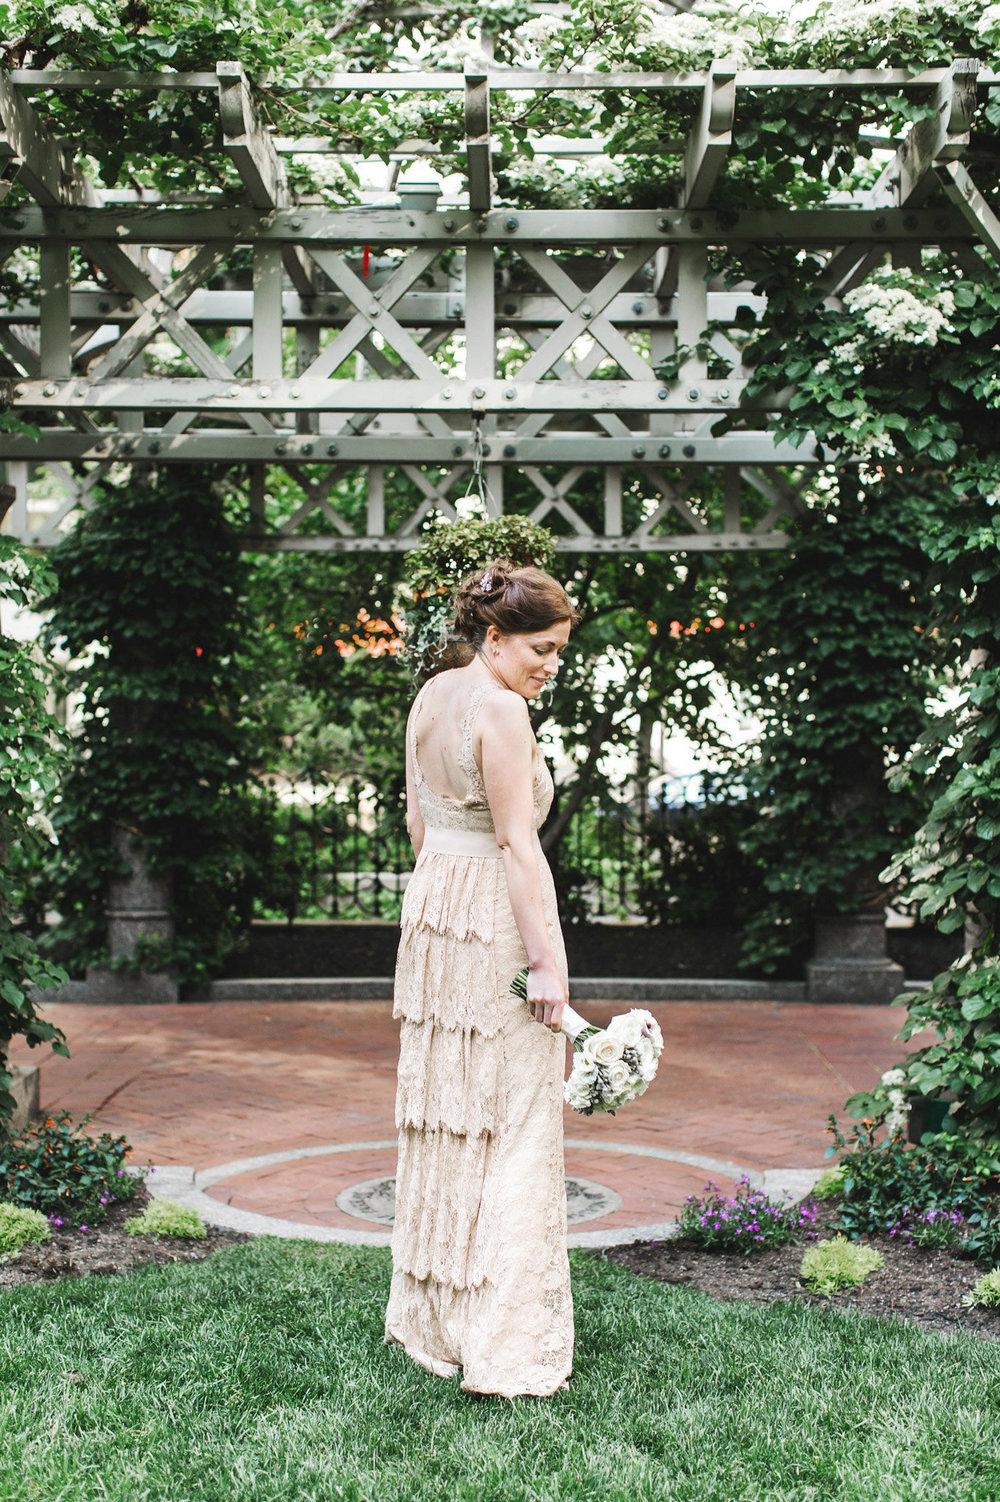 2-Boston_Wedding_Photographer_Lena_Mirisola-23.jpg